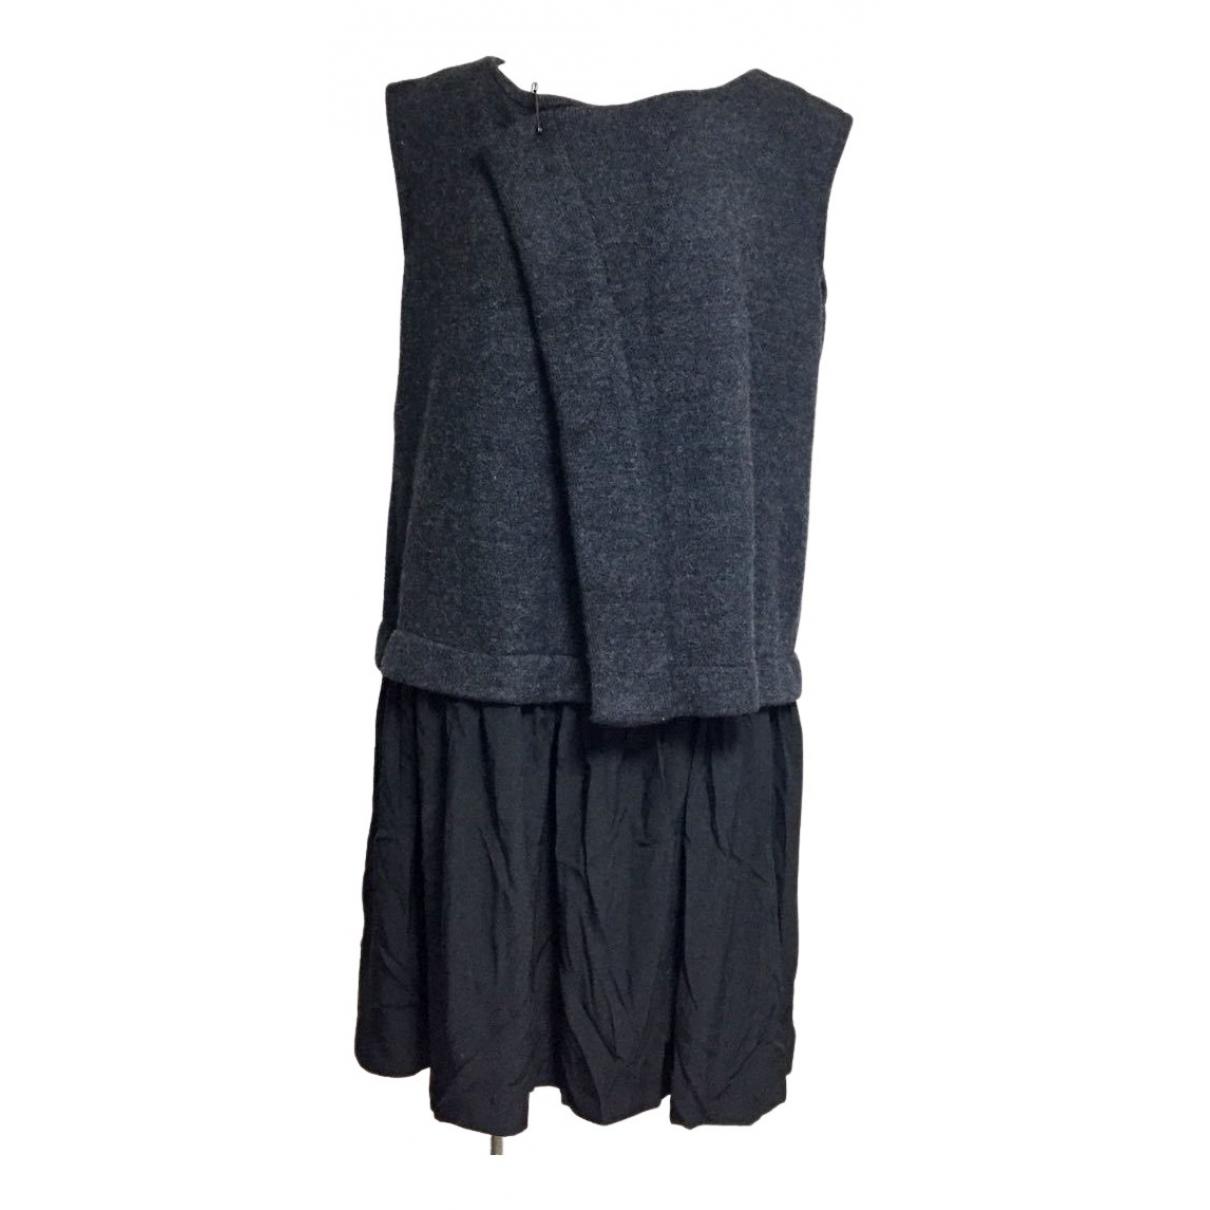 Yohji Yamamoto \N Kleid in  Grau Wolle